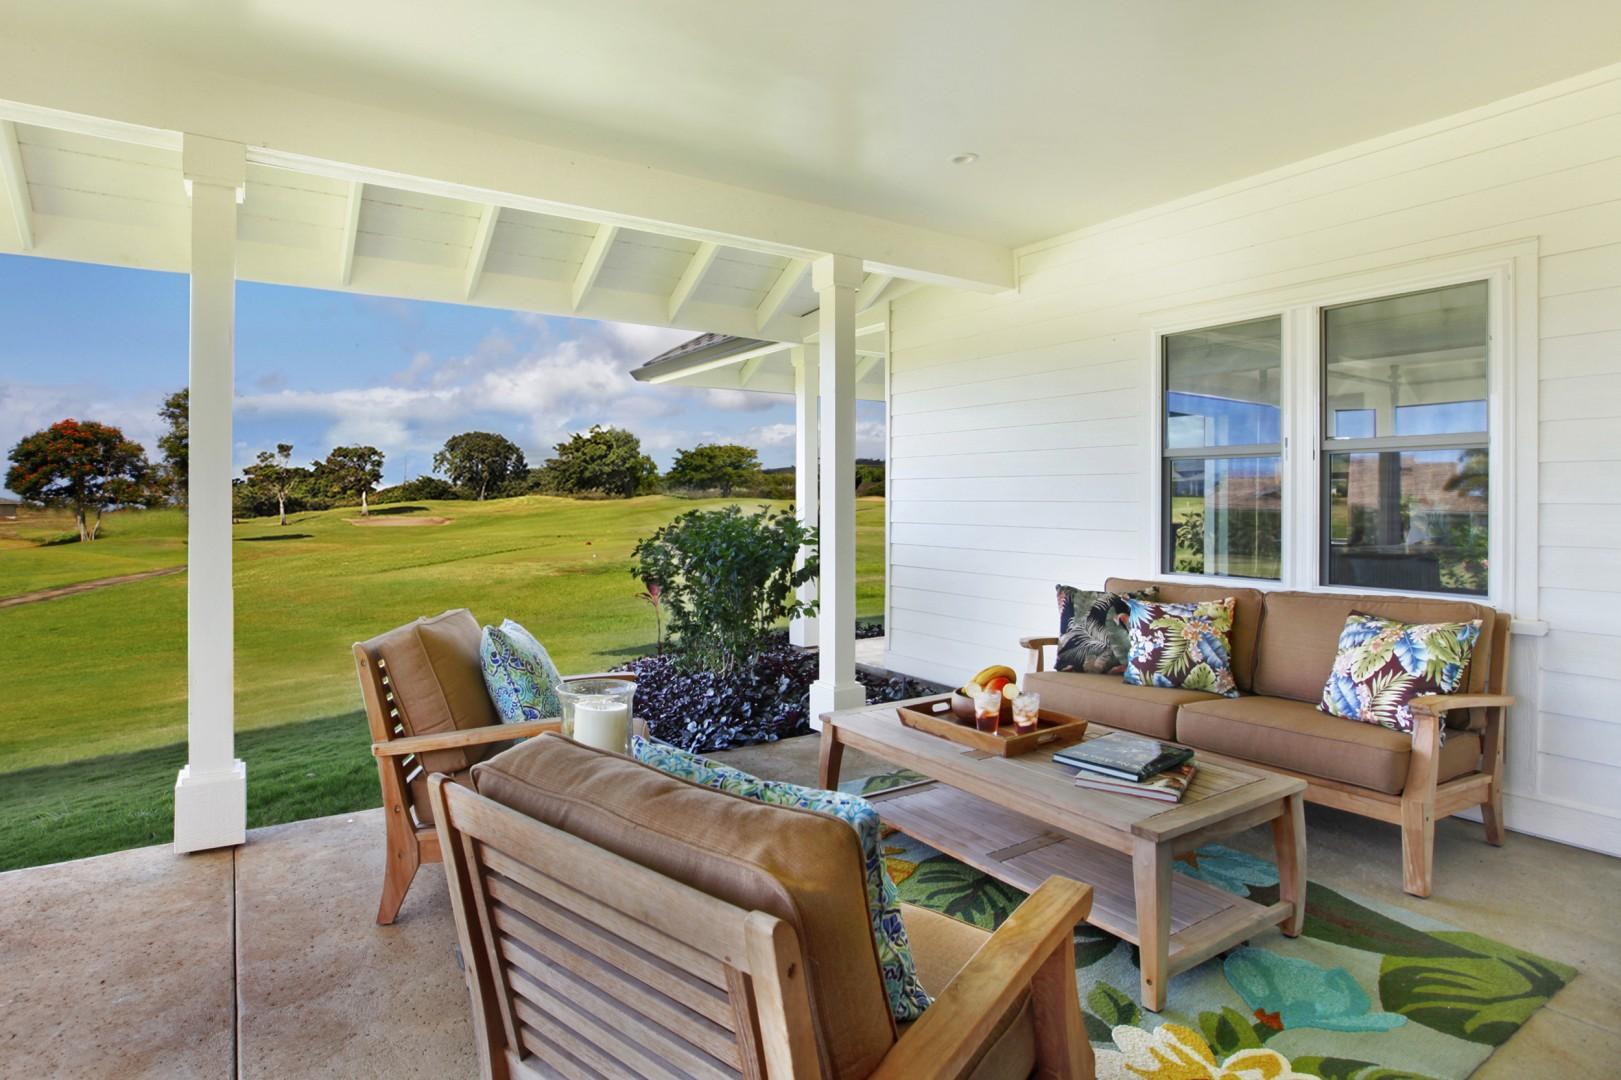 Lanai with views of the Kiahuna golf course